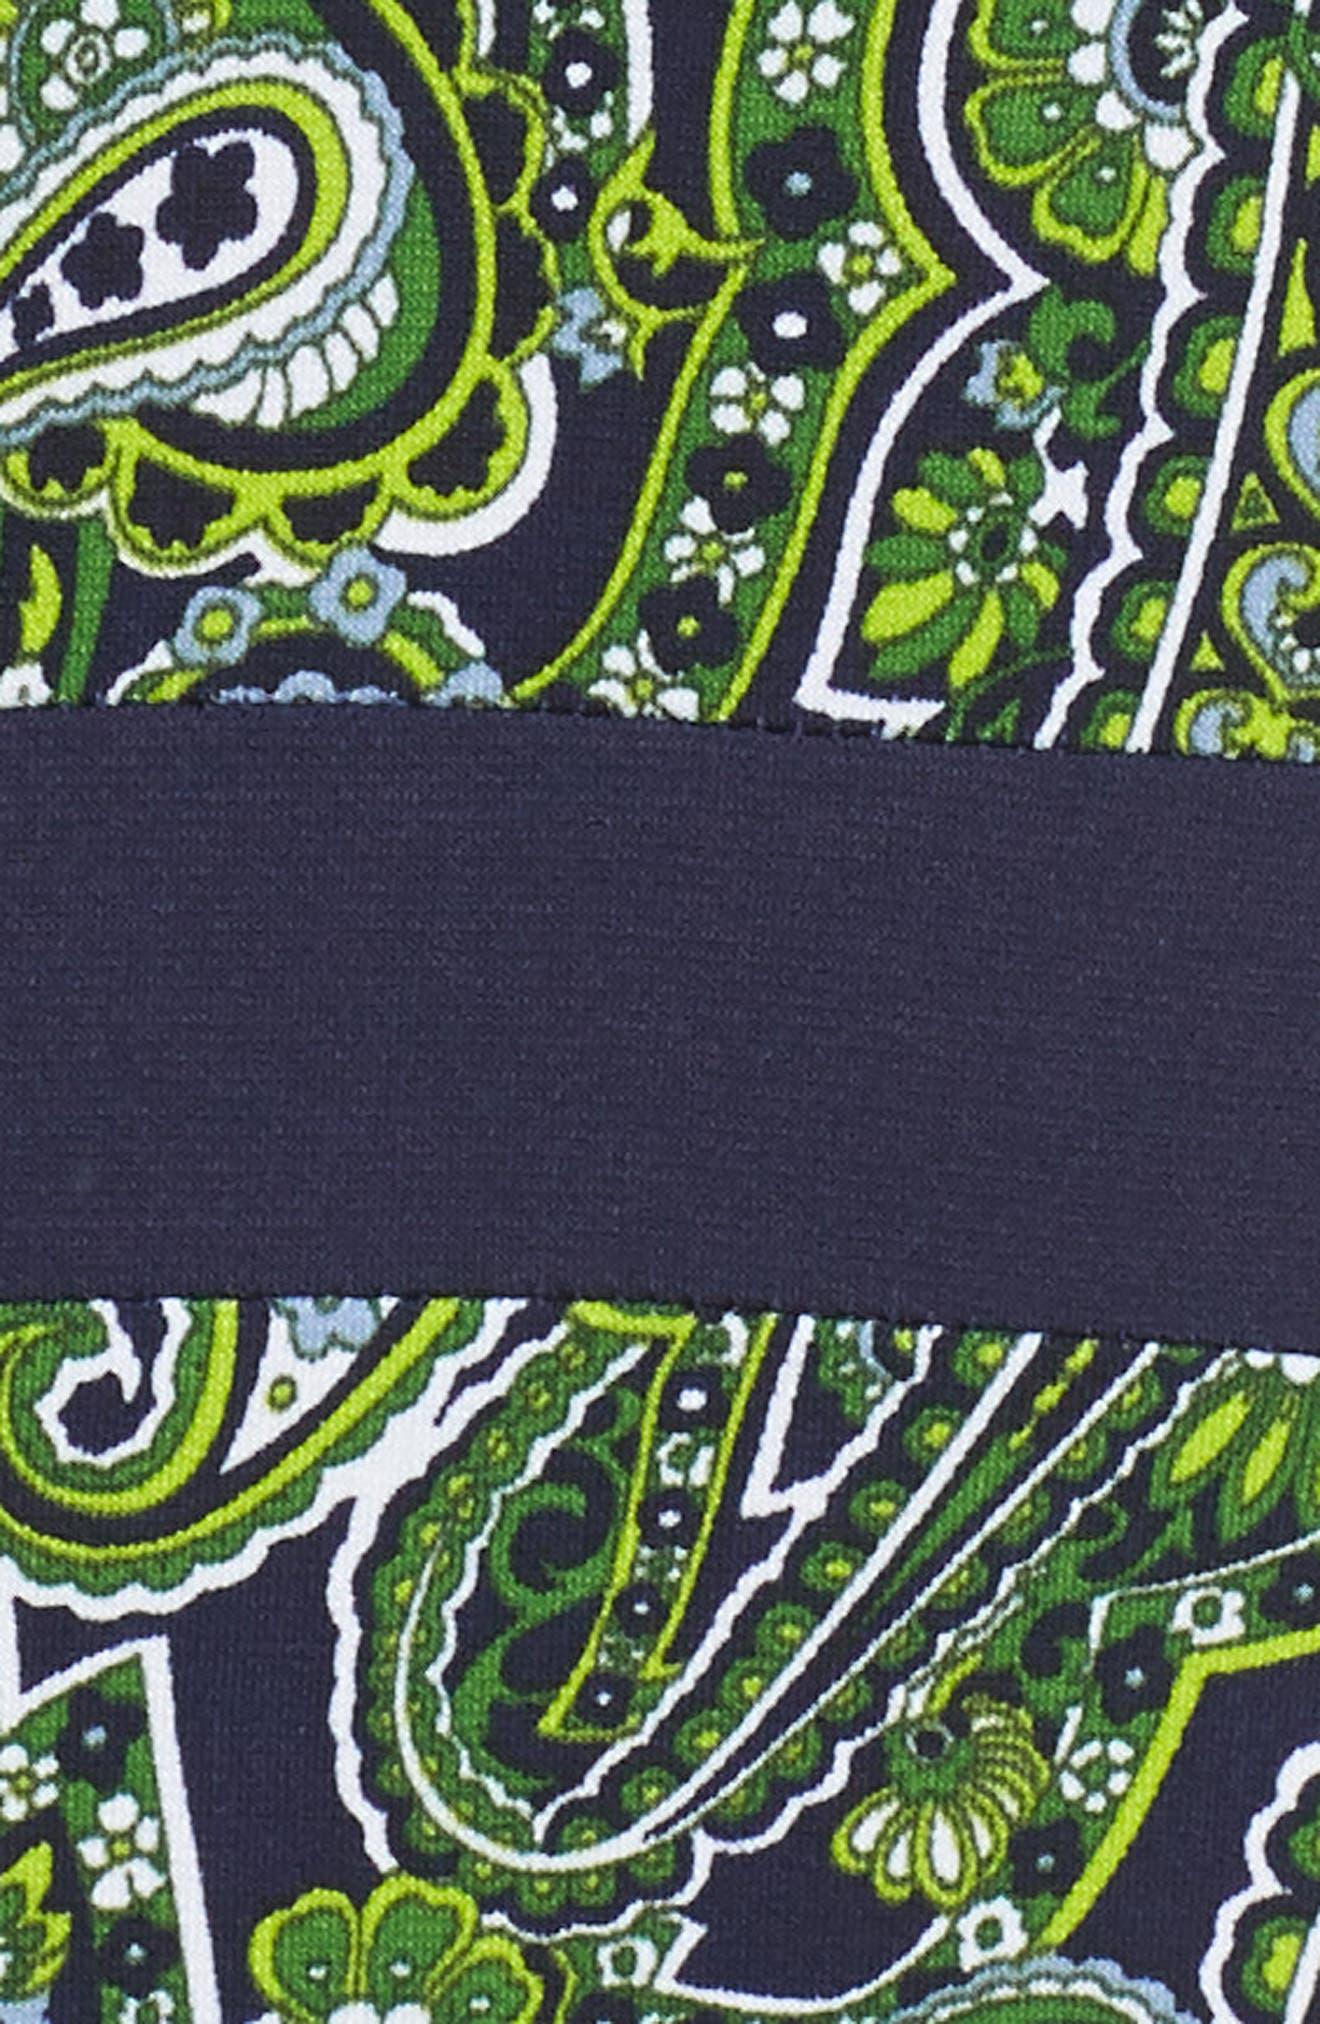 Paisley Paneled Dress,                             Alternate thumbnail 5, color,                             True Navy/ Green Apple Mu